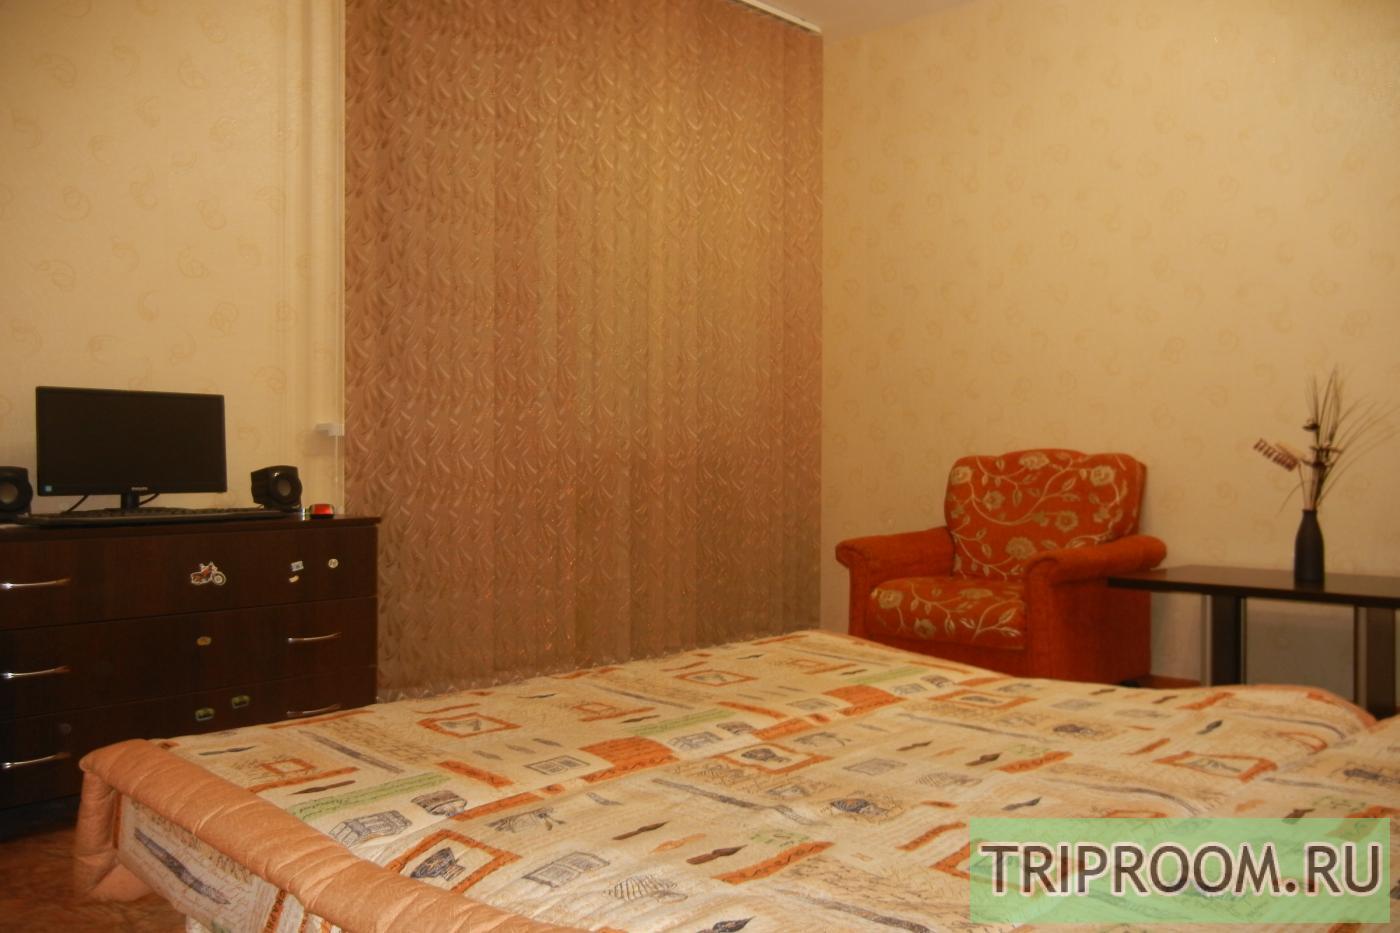 2-комнатная квартира посуточно (вариант № 13501), ул. Пеше-стрелецкая улица, фото № 6